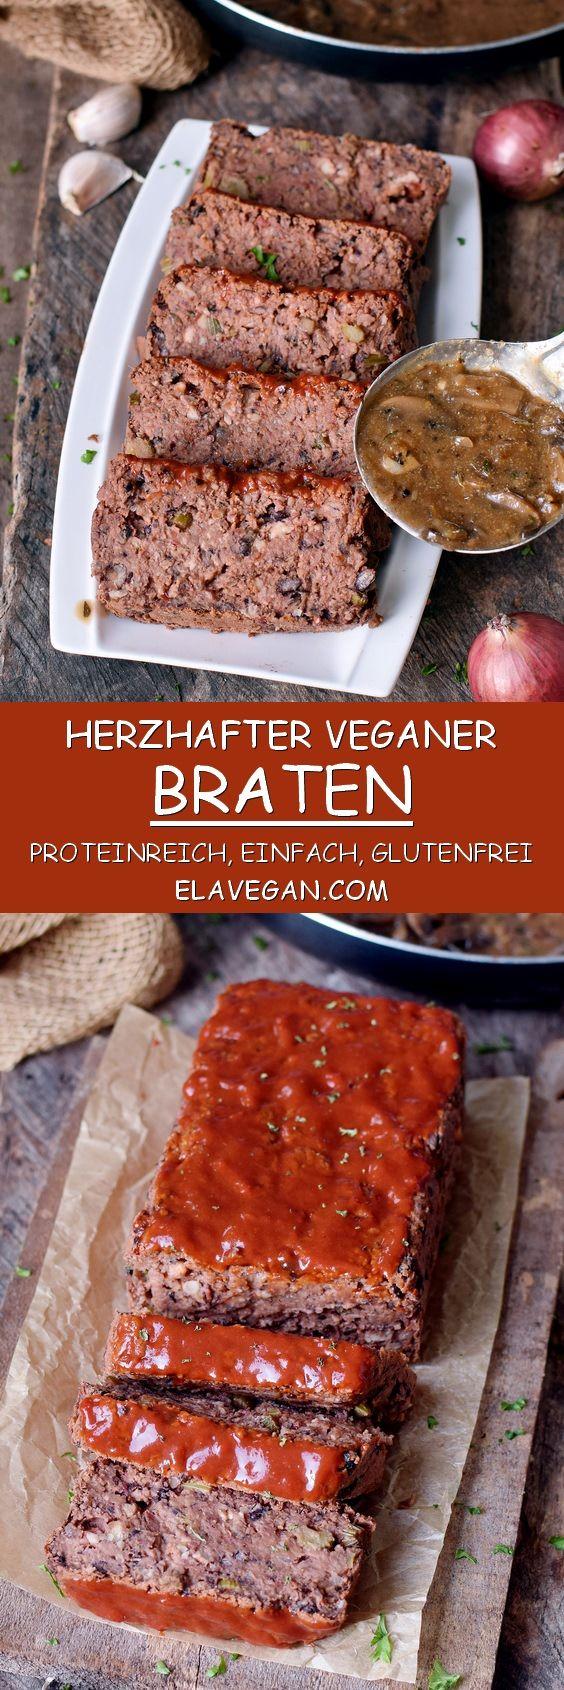 Veganer Braten (fleischloser Hackbraten) | glutenfreies Rezept - Elavegan